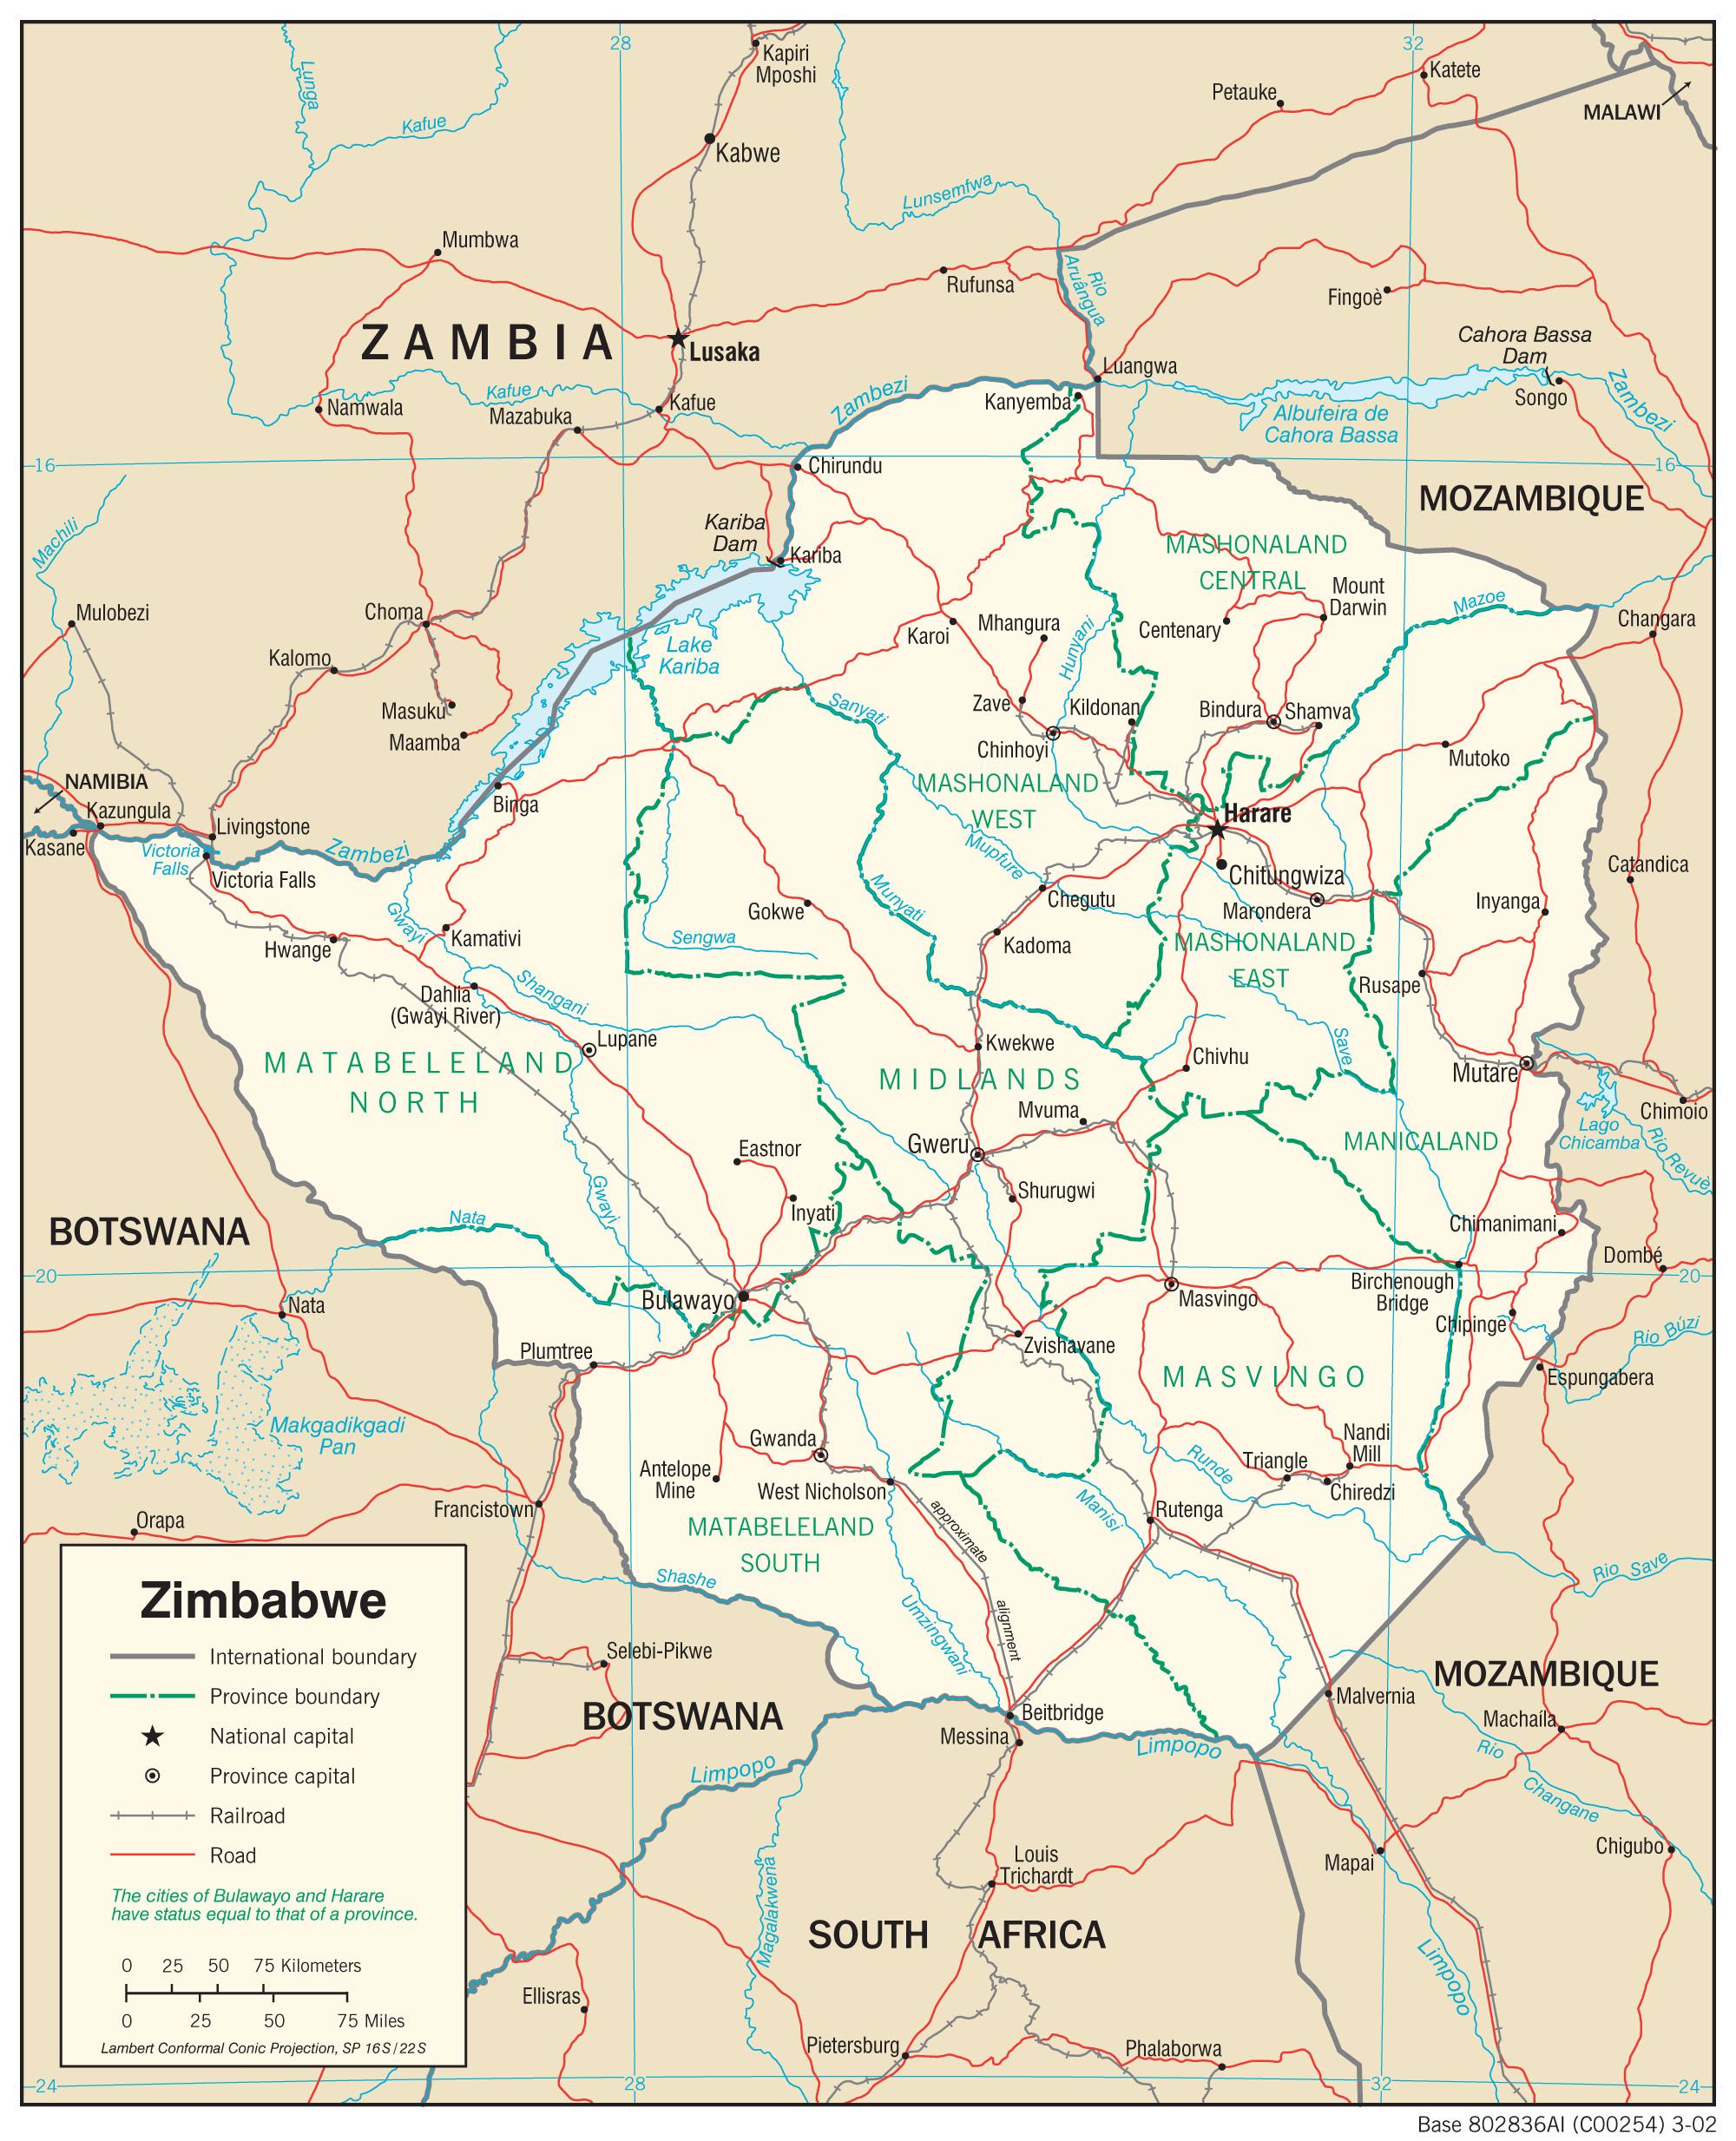 Zimbabwe Maps PerryCastañeda Map Collection UT Library Online - Zimbabwe map